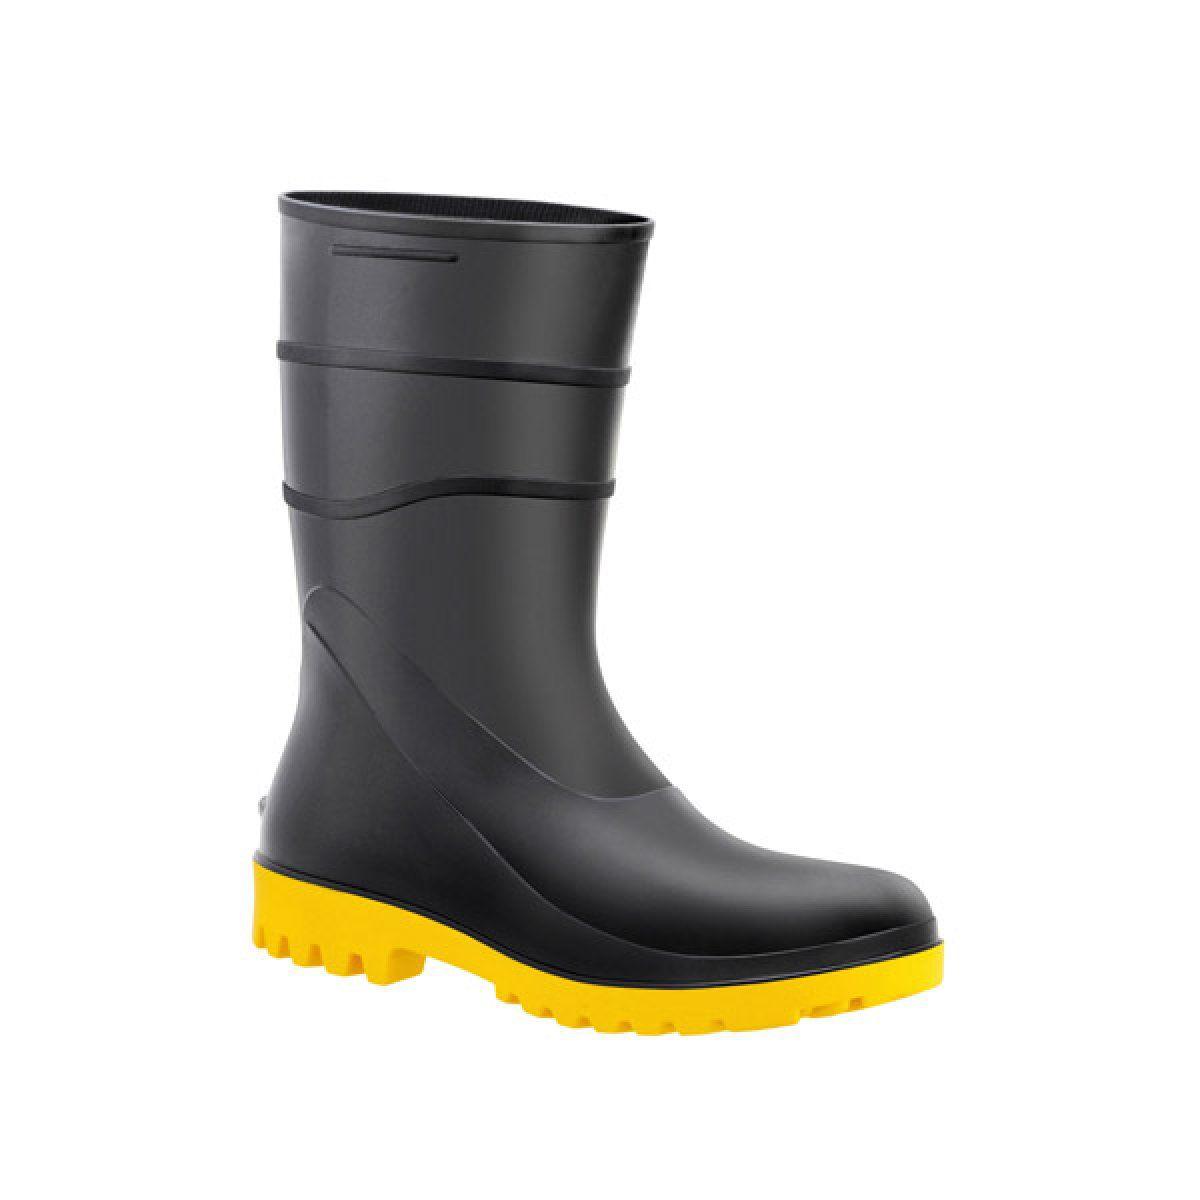 Bota de PVC Preta c/ Solado Amarelo N°42 - BRACOL